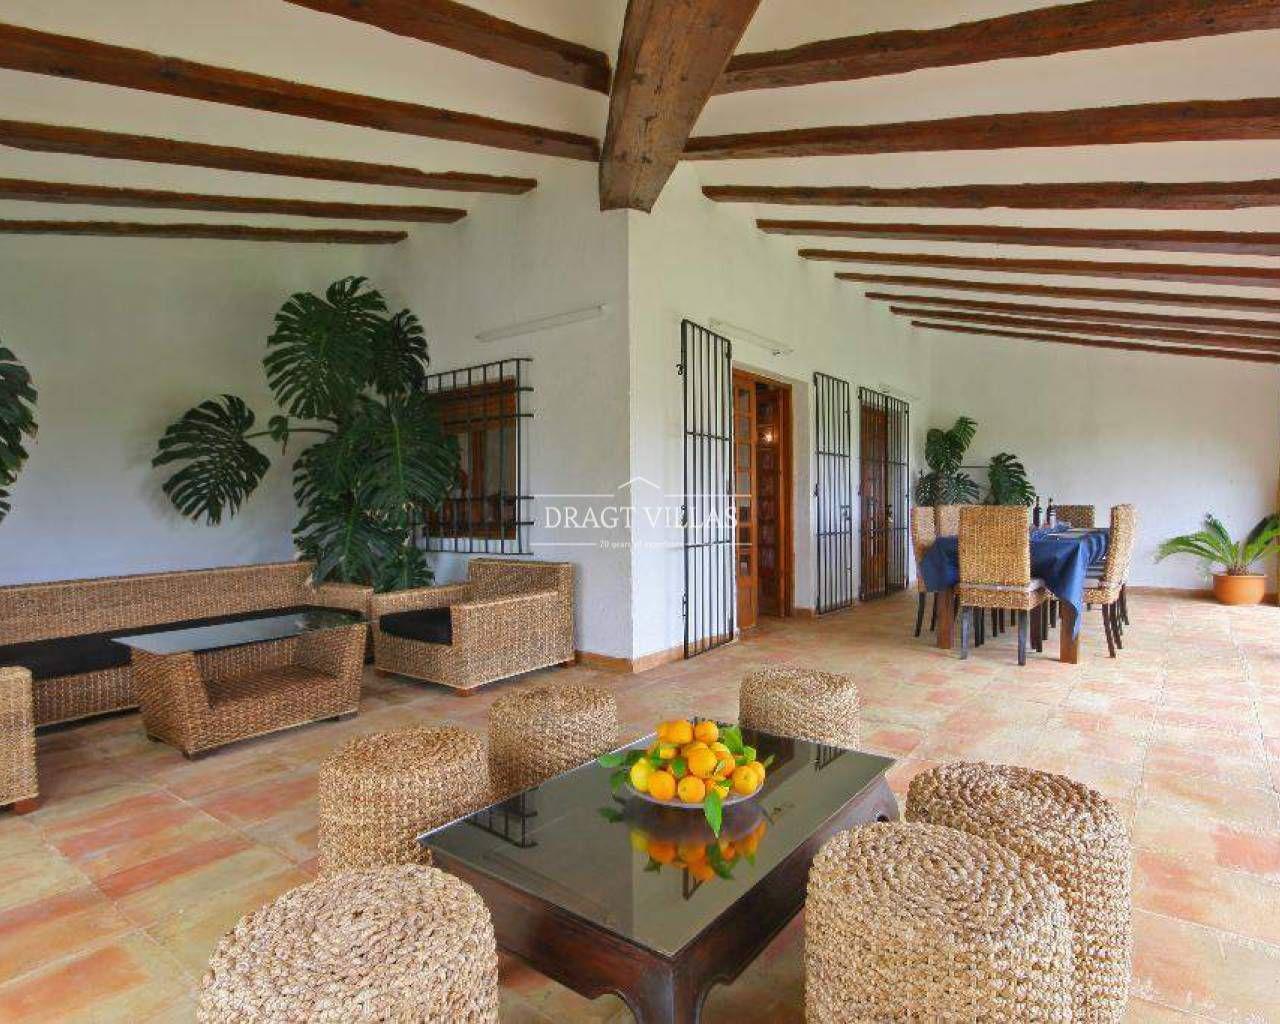 Sale Finca Javea Javea Alicante Spain Property For Sale Building A House Property